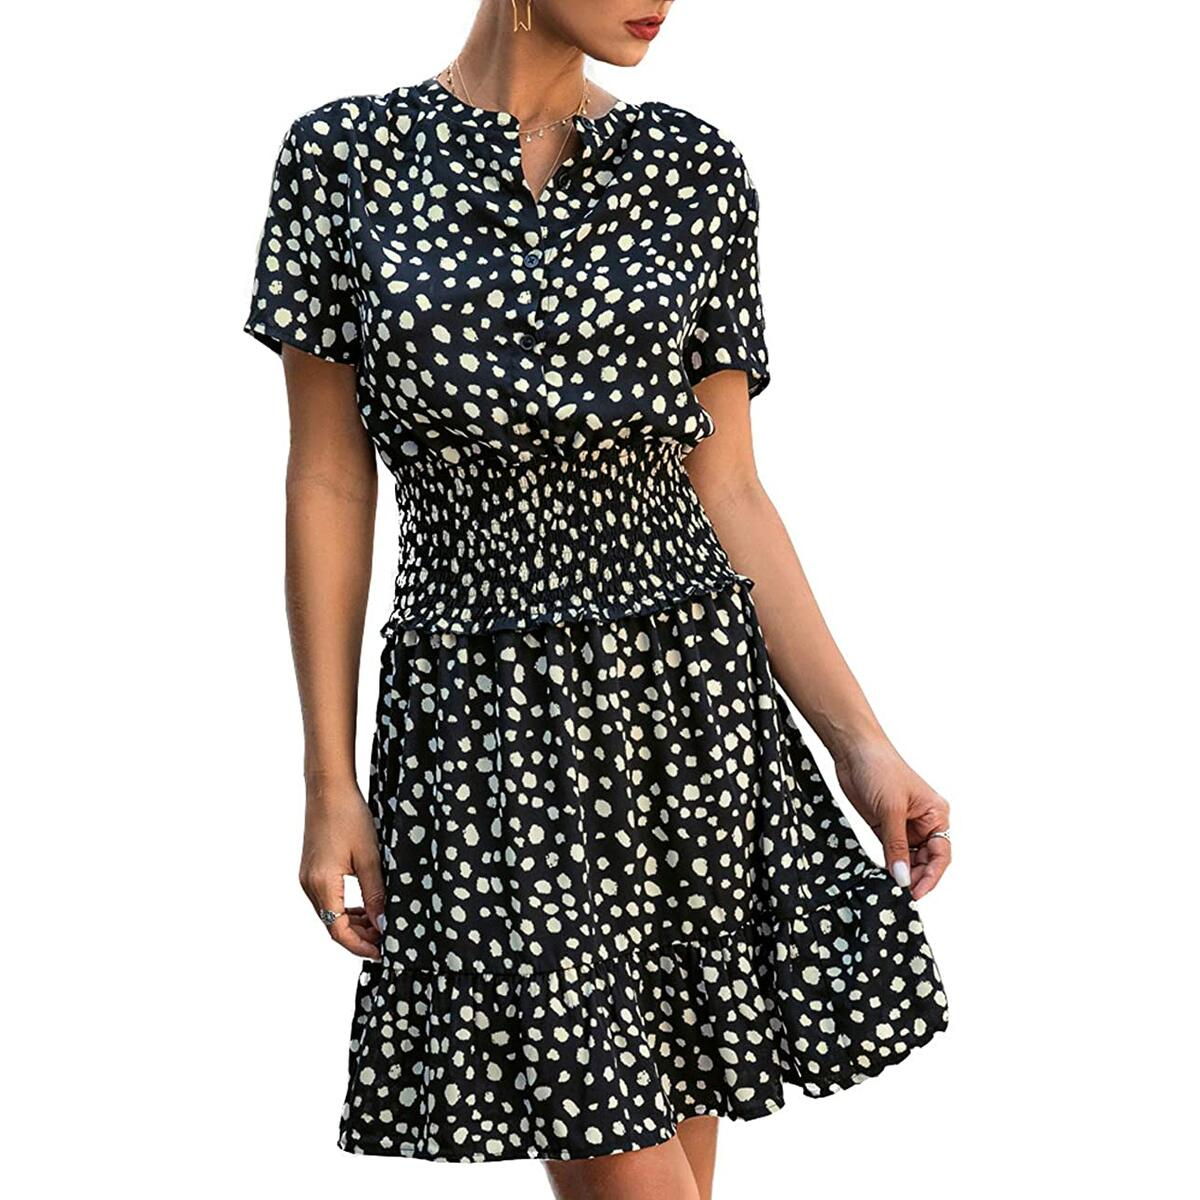 Women's Summer Polka Dot Ruffle Short Sleeve Dress Casual Mini Dress All Colors